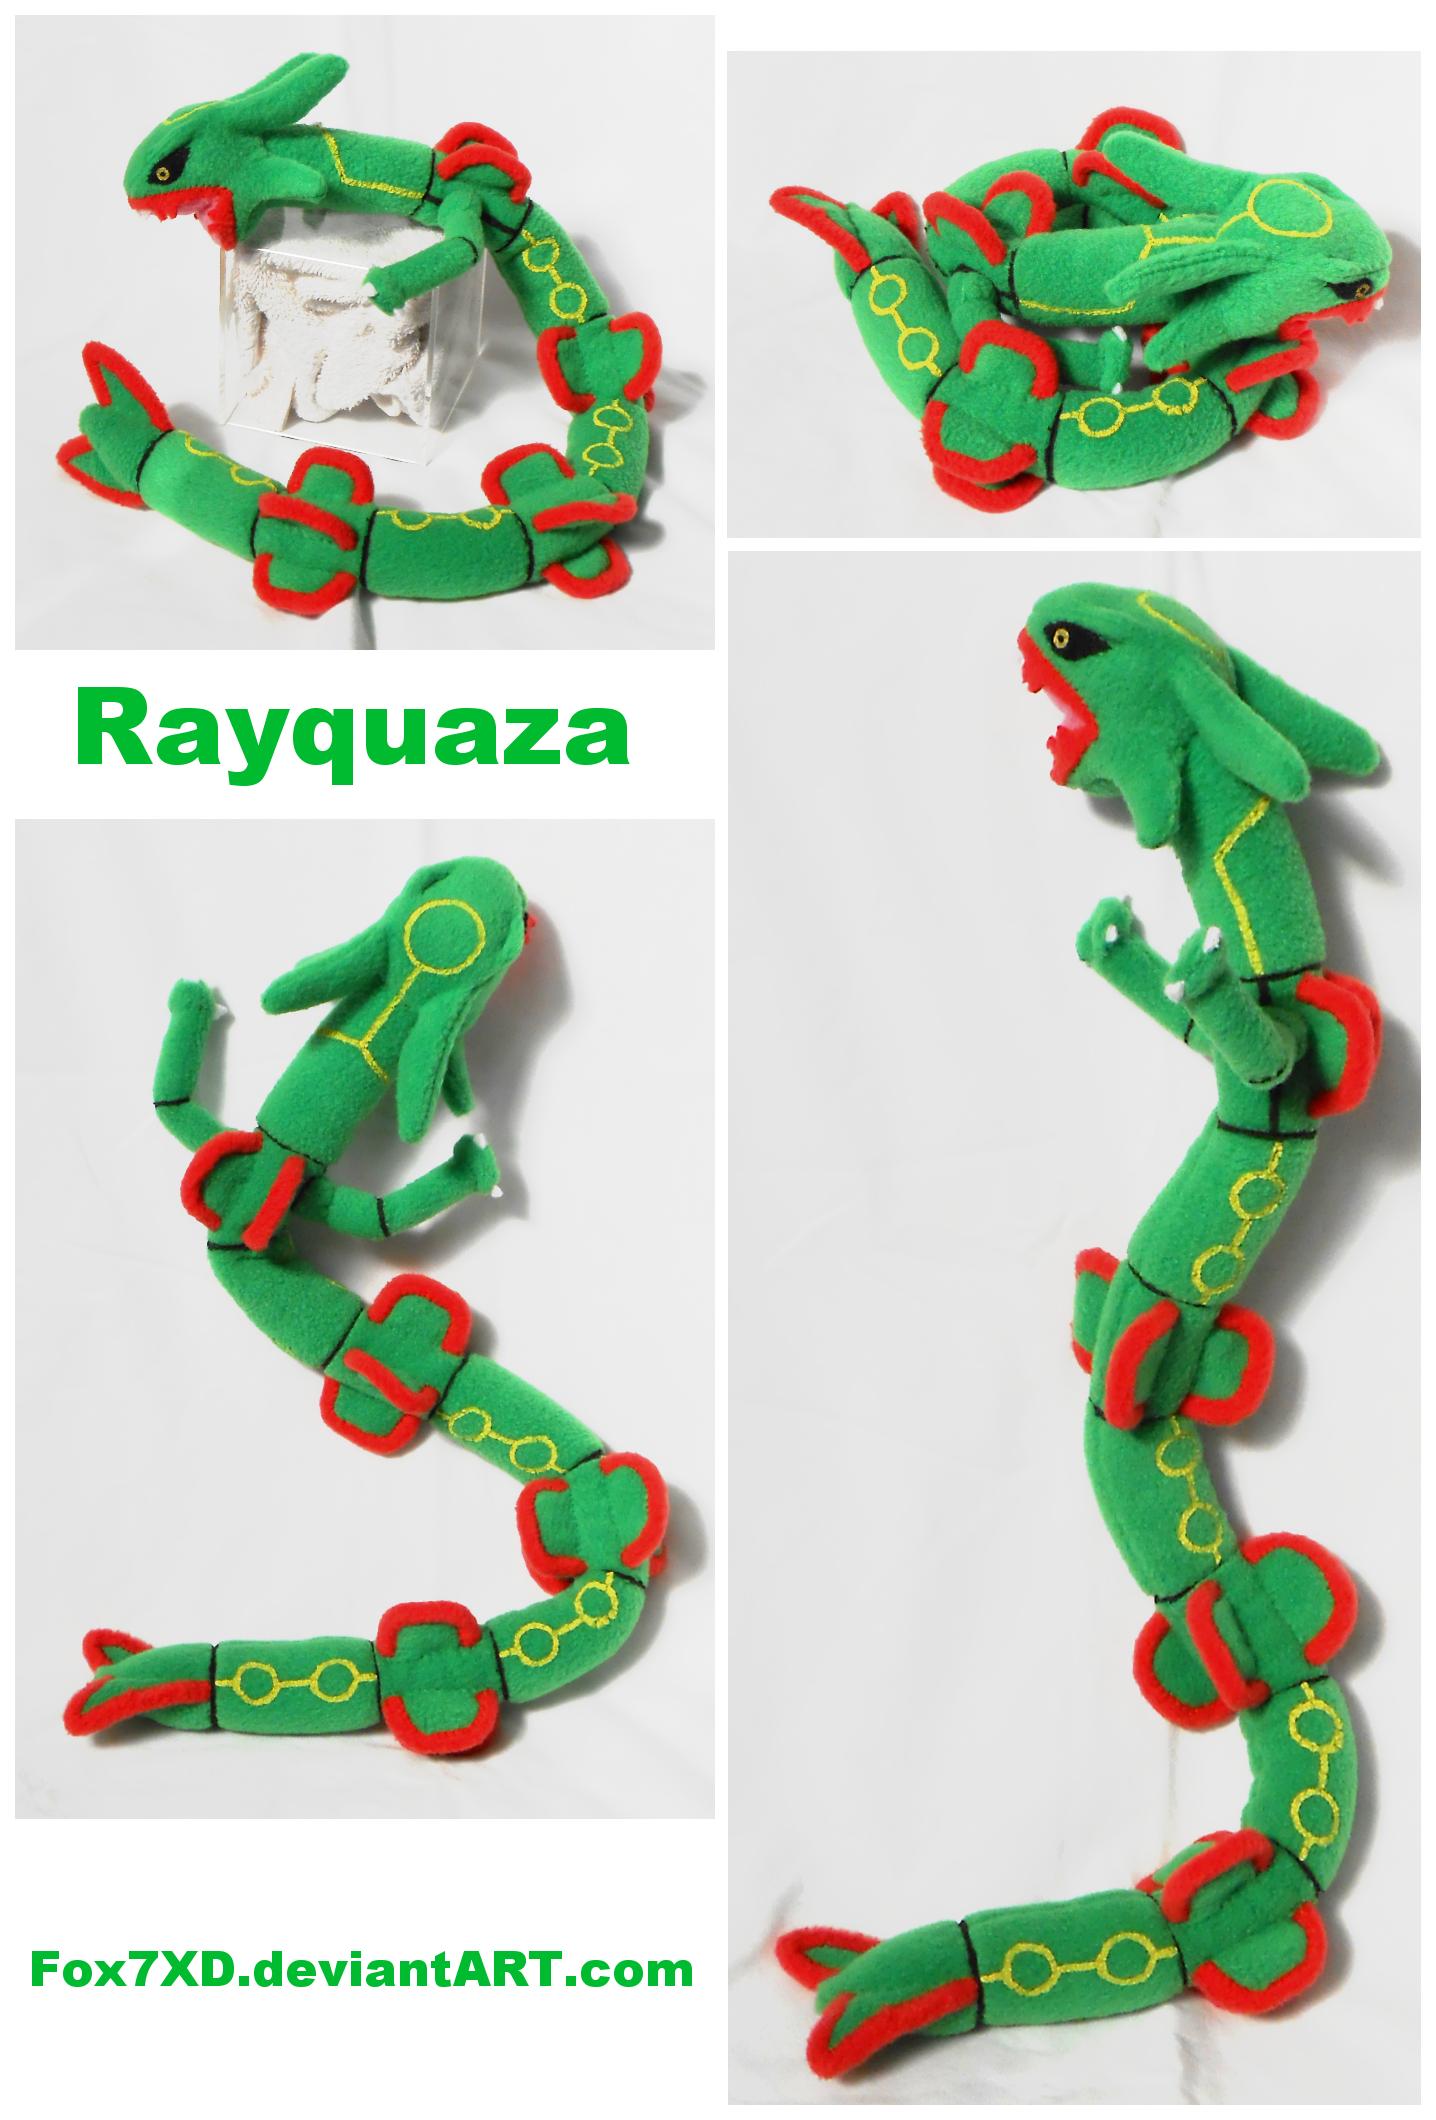 Rayquaza mini Plush by Fox7XD